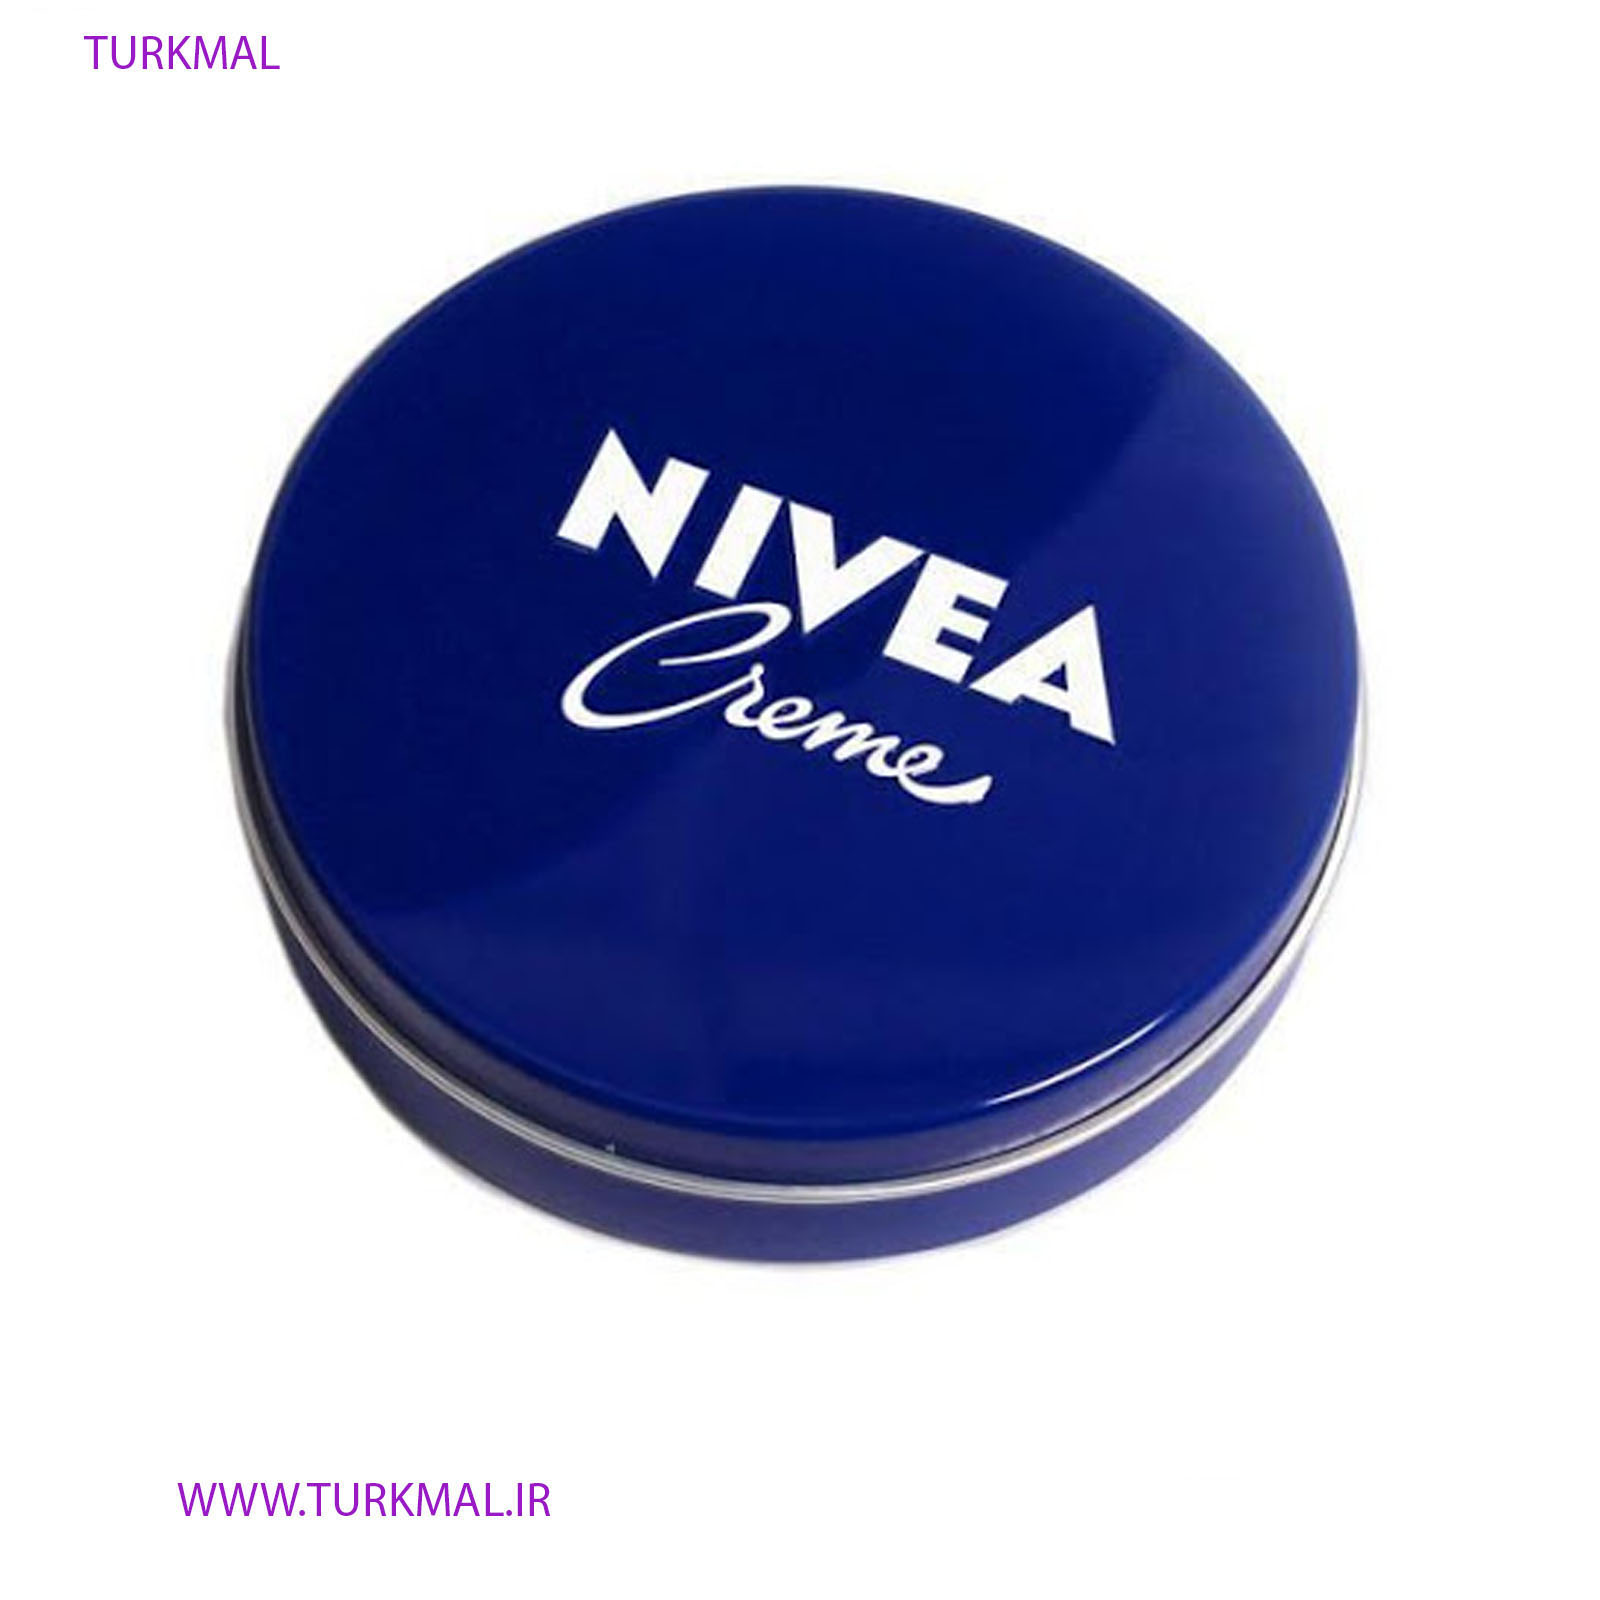 Creme کرم مرطوب کننده نیوآ Nivea حجم ۲۵۰میلی